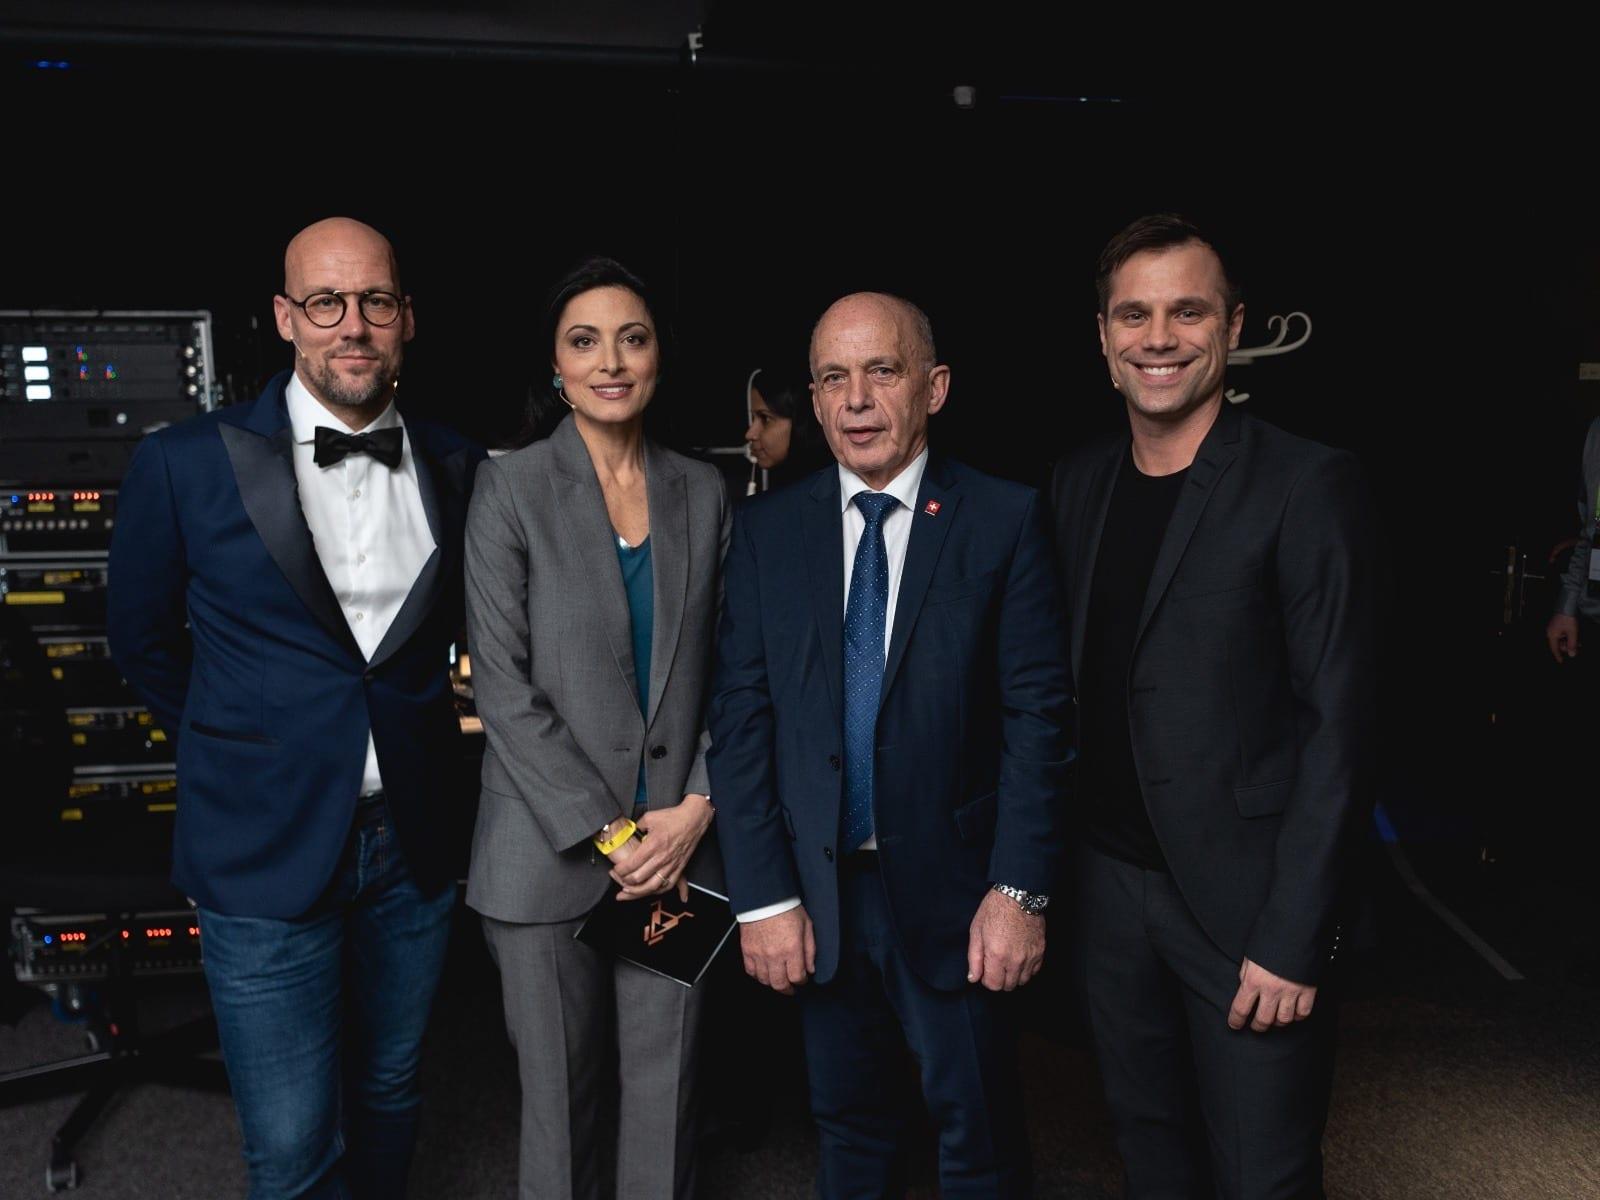 worldwebforum-2019-fabian-hediger-ghida-fakhry-ueli-maurer-ole-tillmann